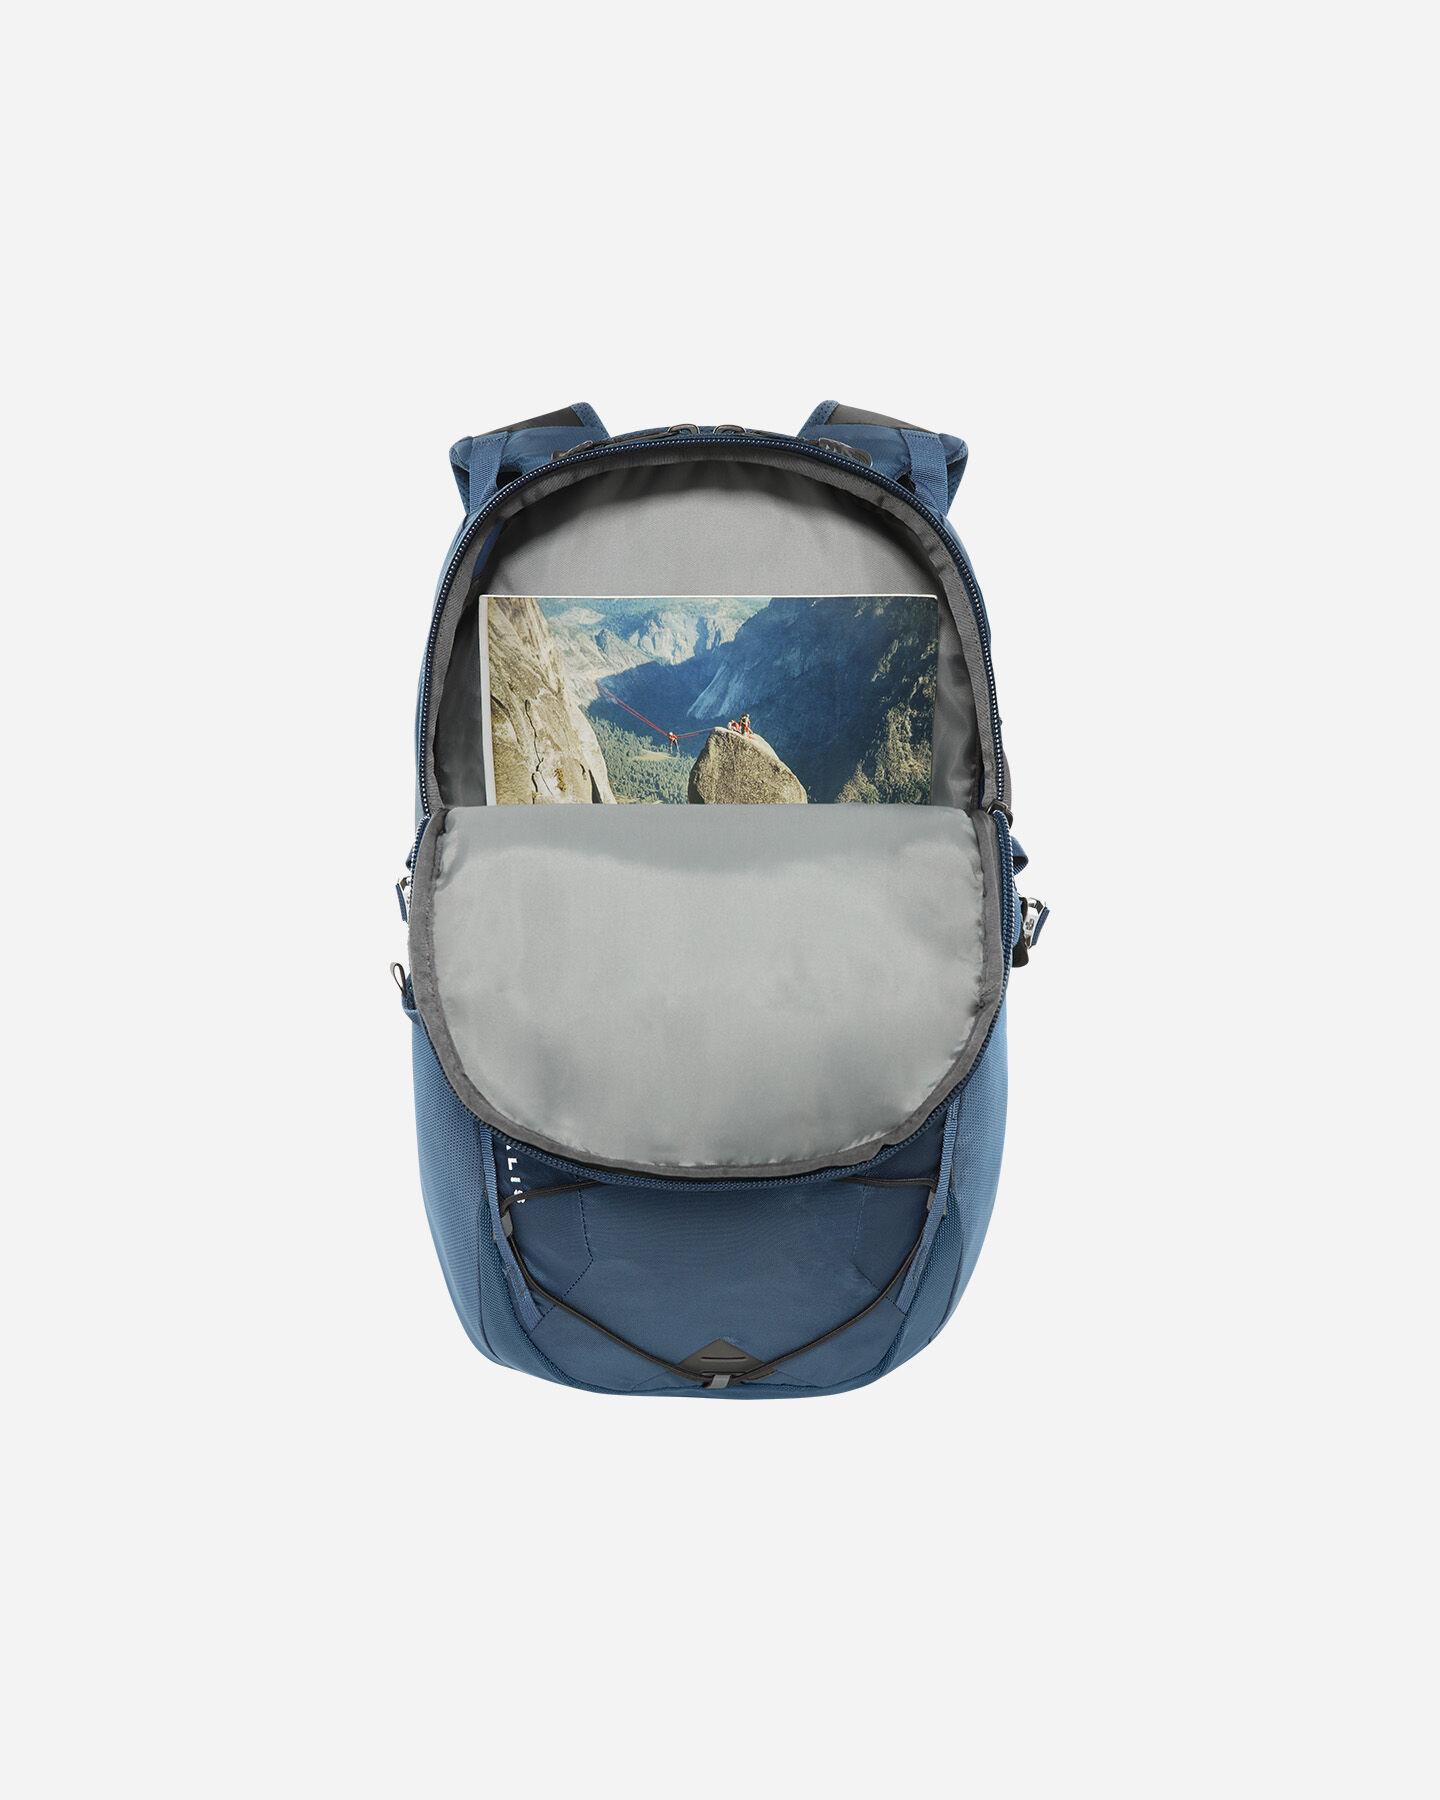 Zaino THE NORTH FACE BOREALIS S5202225|3ZP|OS scatto 3